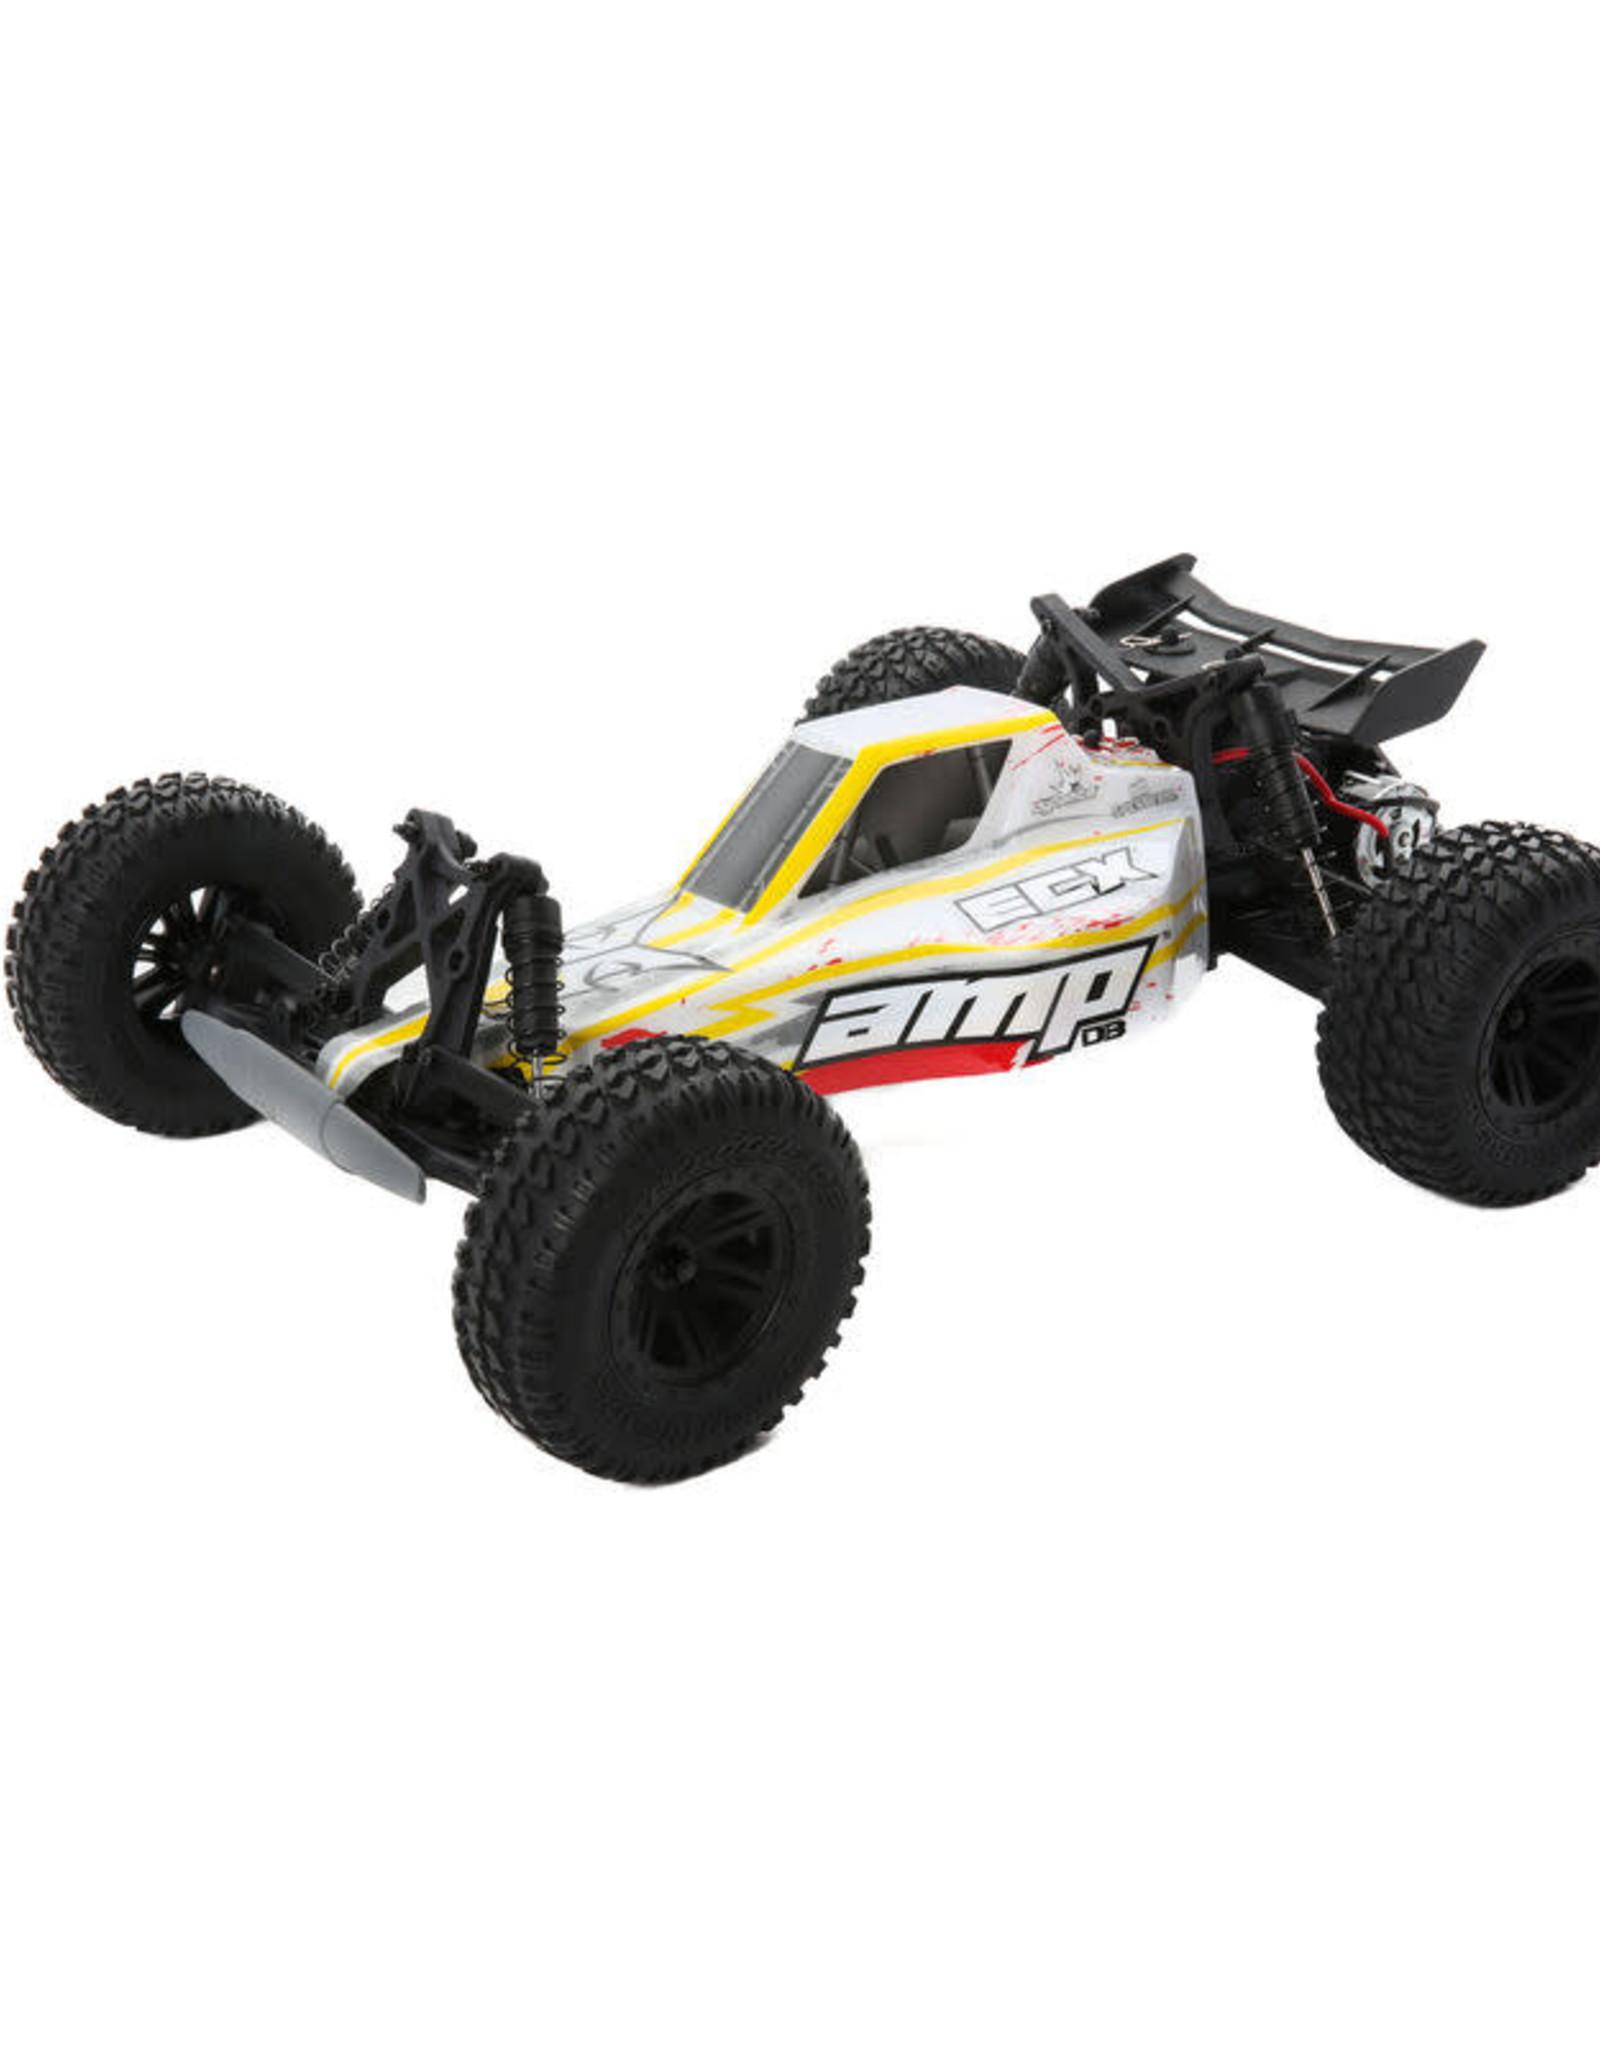 ECX ECX03029T2 AMP DB 1:10 2WD Desert Buggy: White/Red RTR